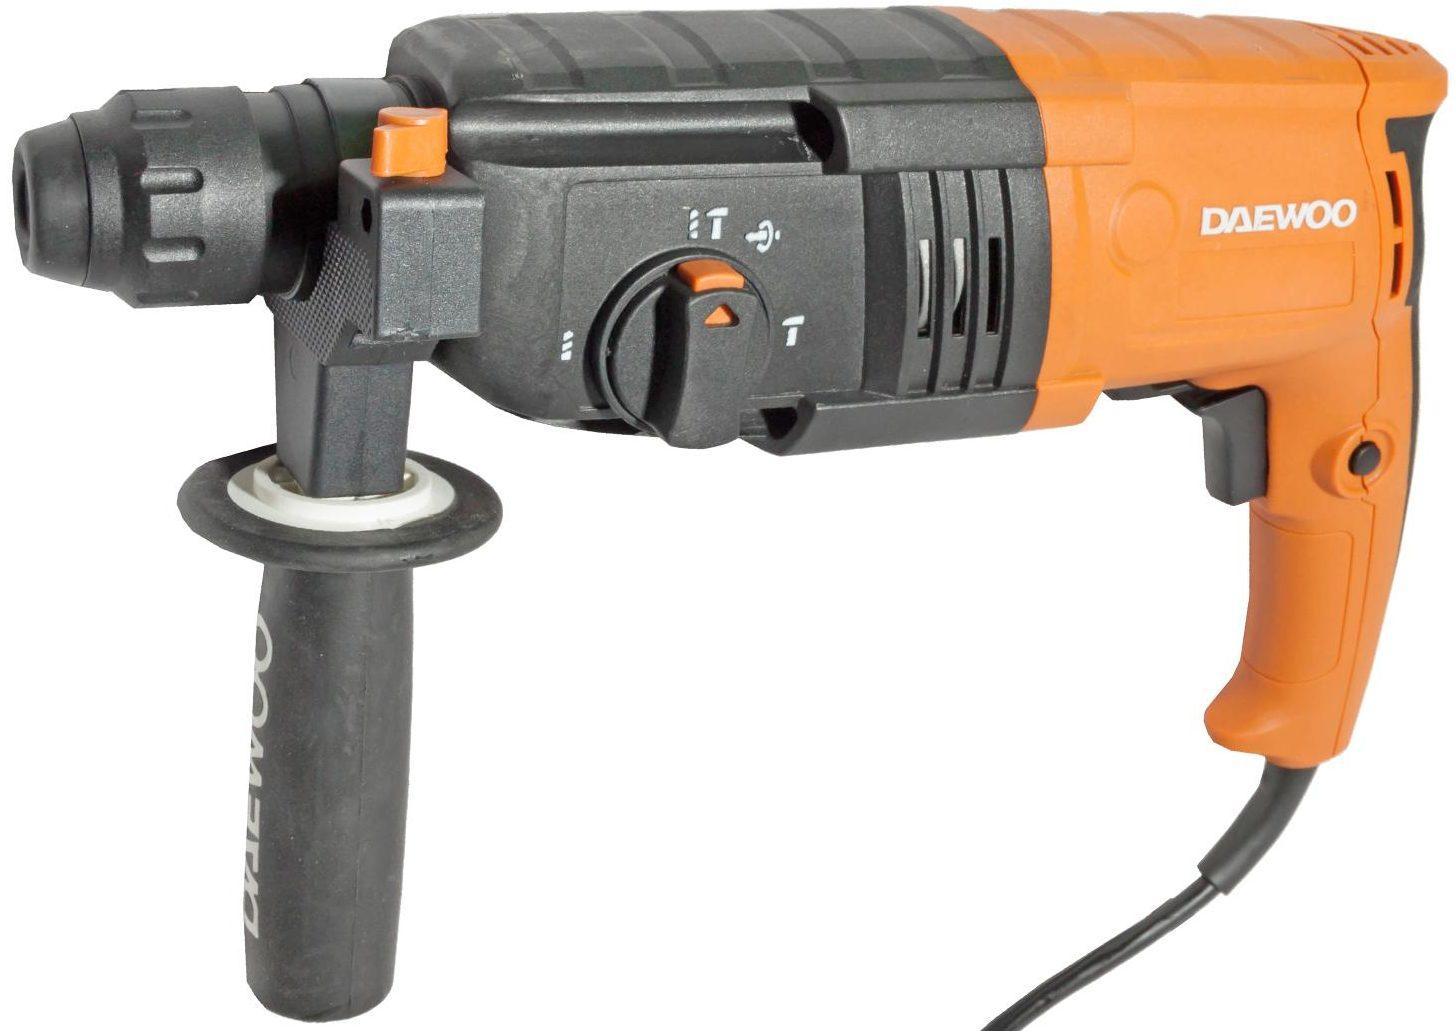 DAEWOO POWER PRODUCTS DAH 920